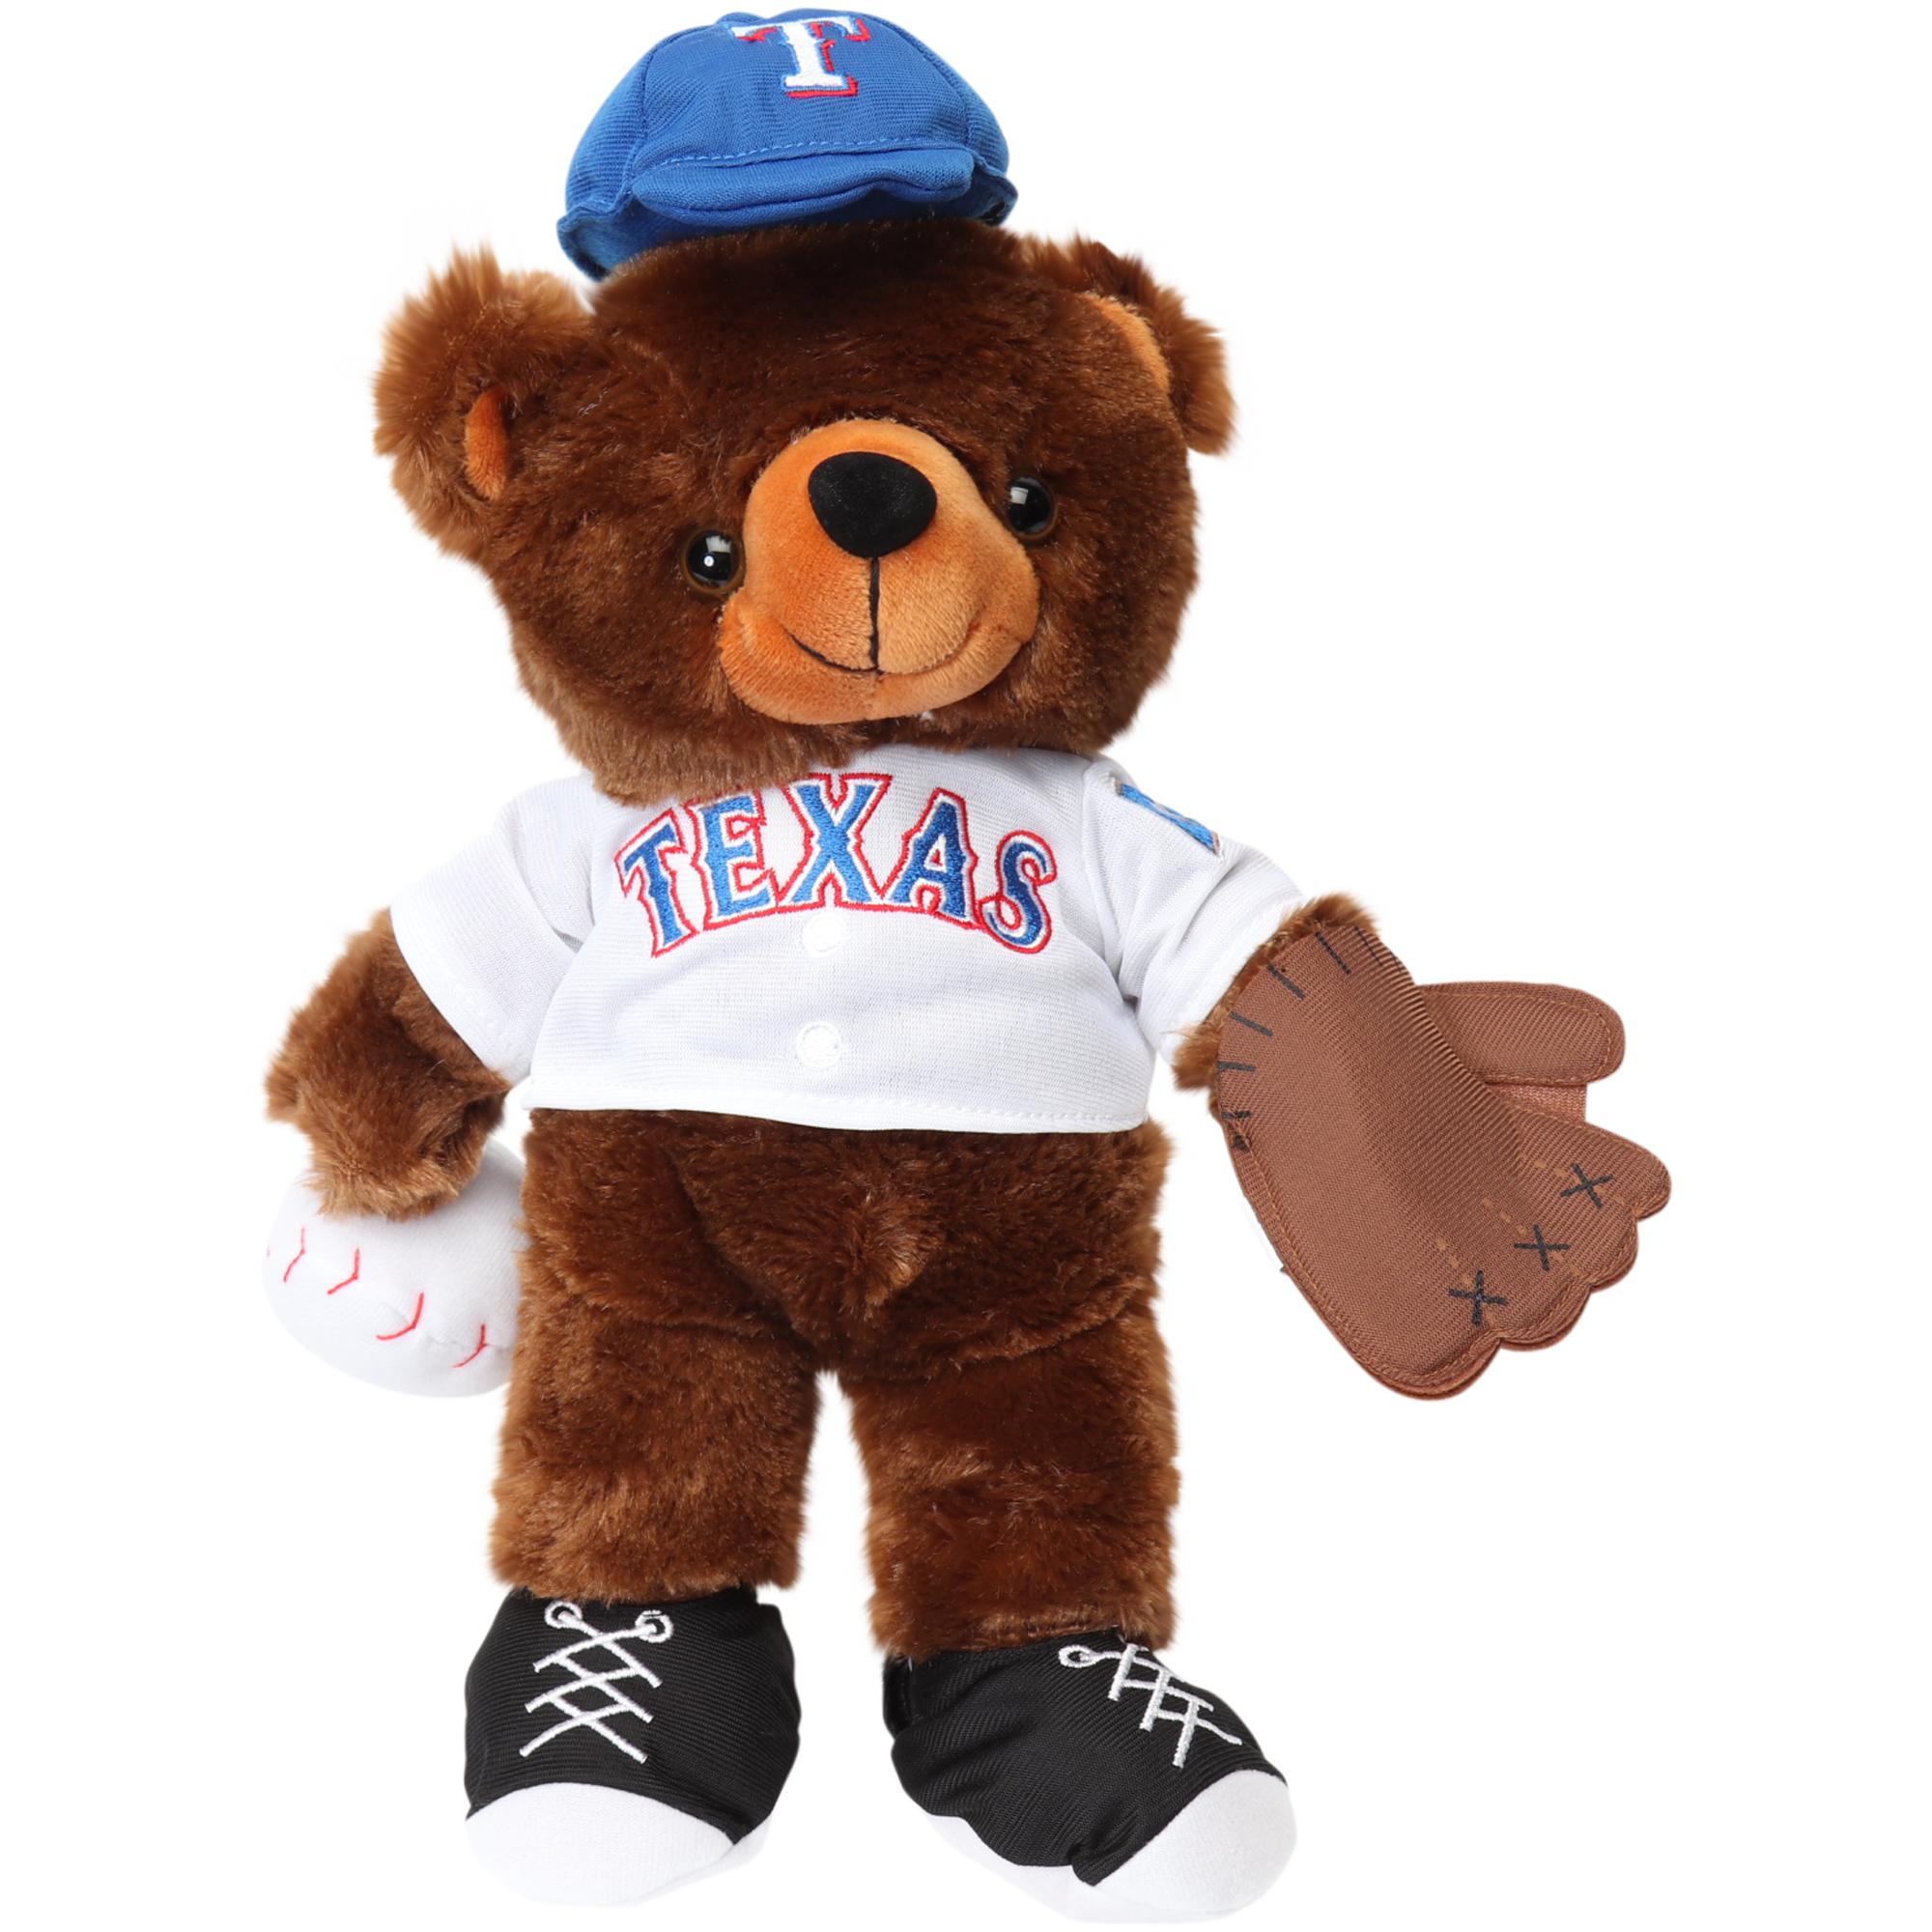 Texas Rangers Locker Room Buddy Dress Me Plush Bear Kit - No Size